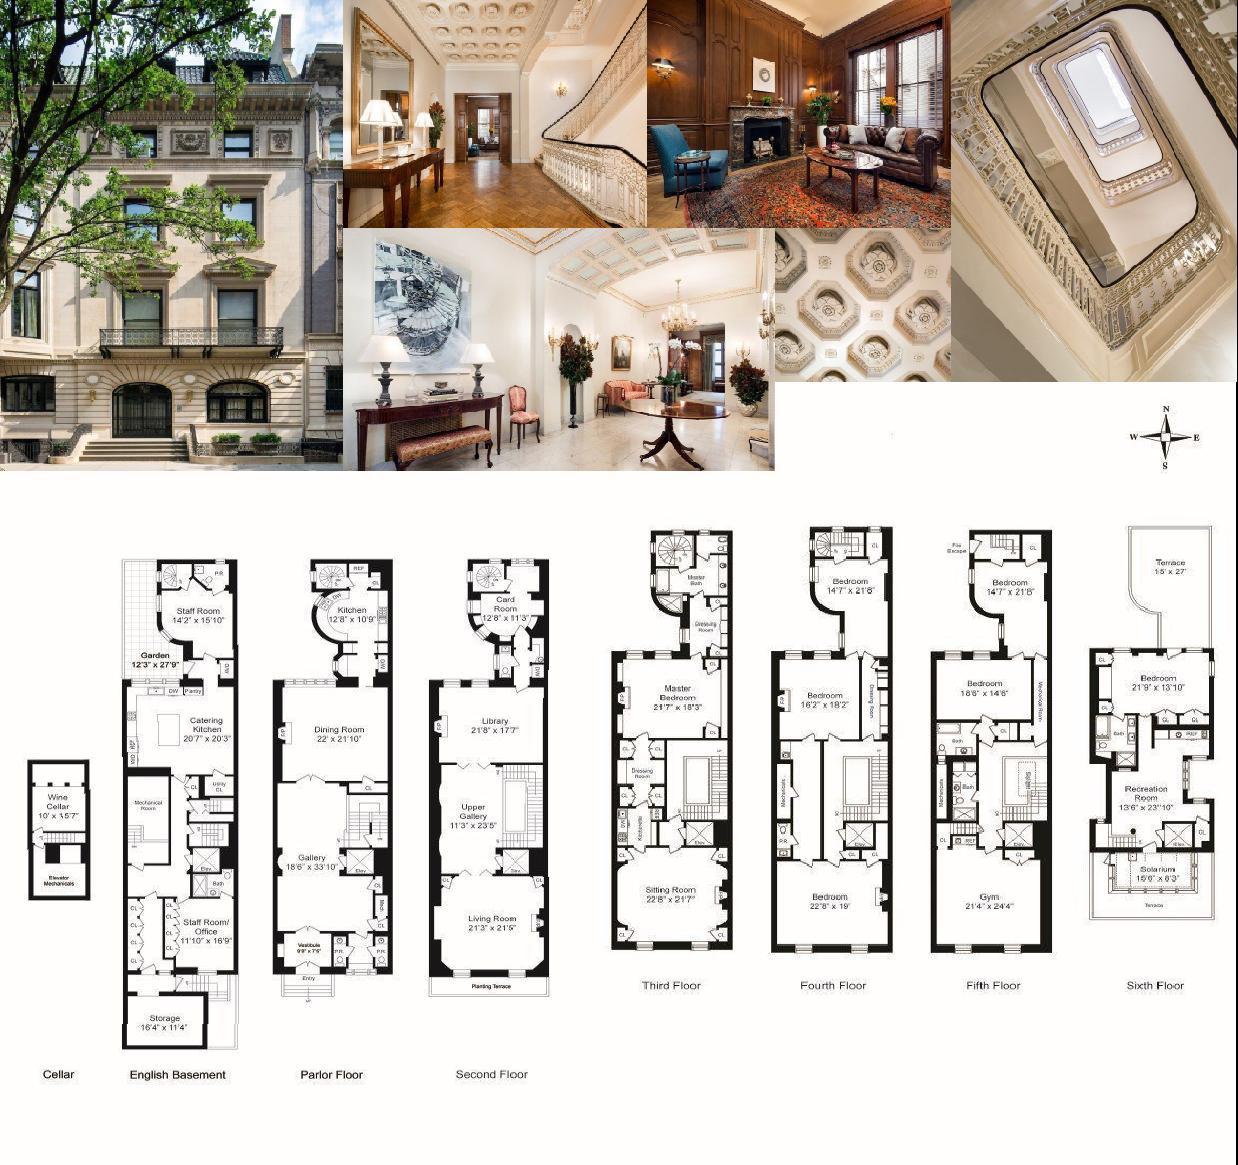 Upper East Side Mansion With Secret Tunnels Seeks 50m Small Apartment Building Plans Architectural Floor Plans Secret House